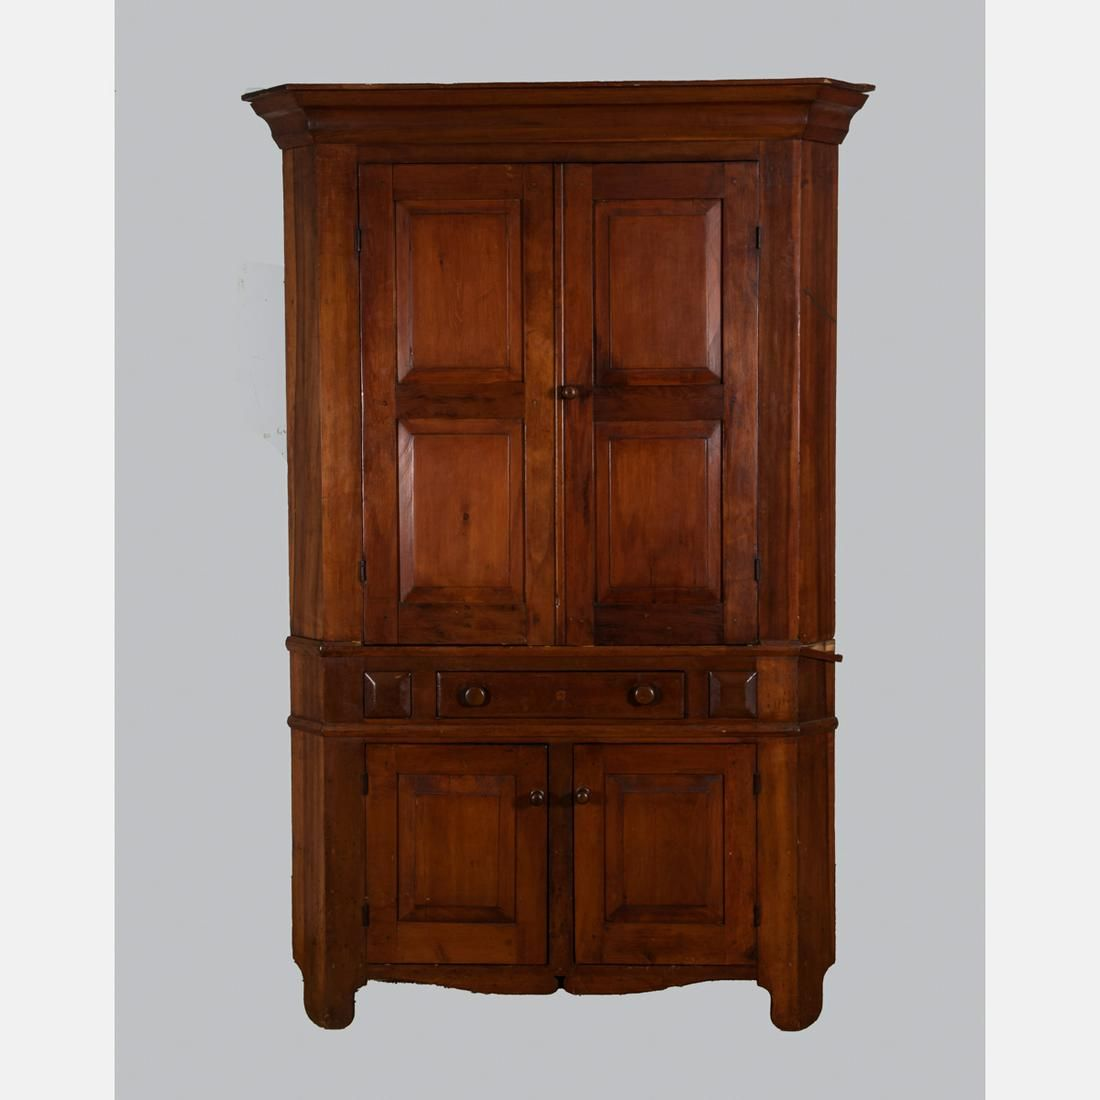 An American Pine Corner Cupboard, 19th Century.